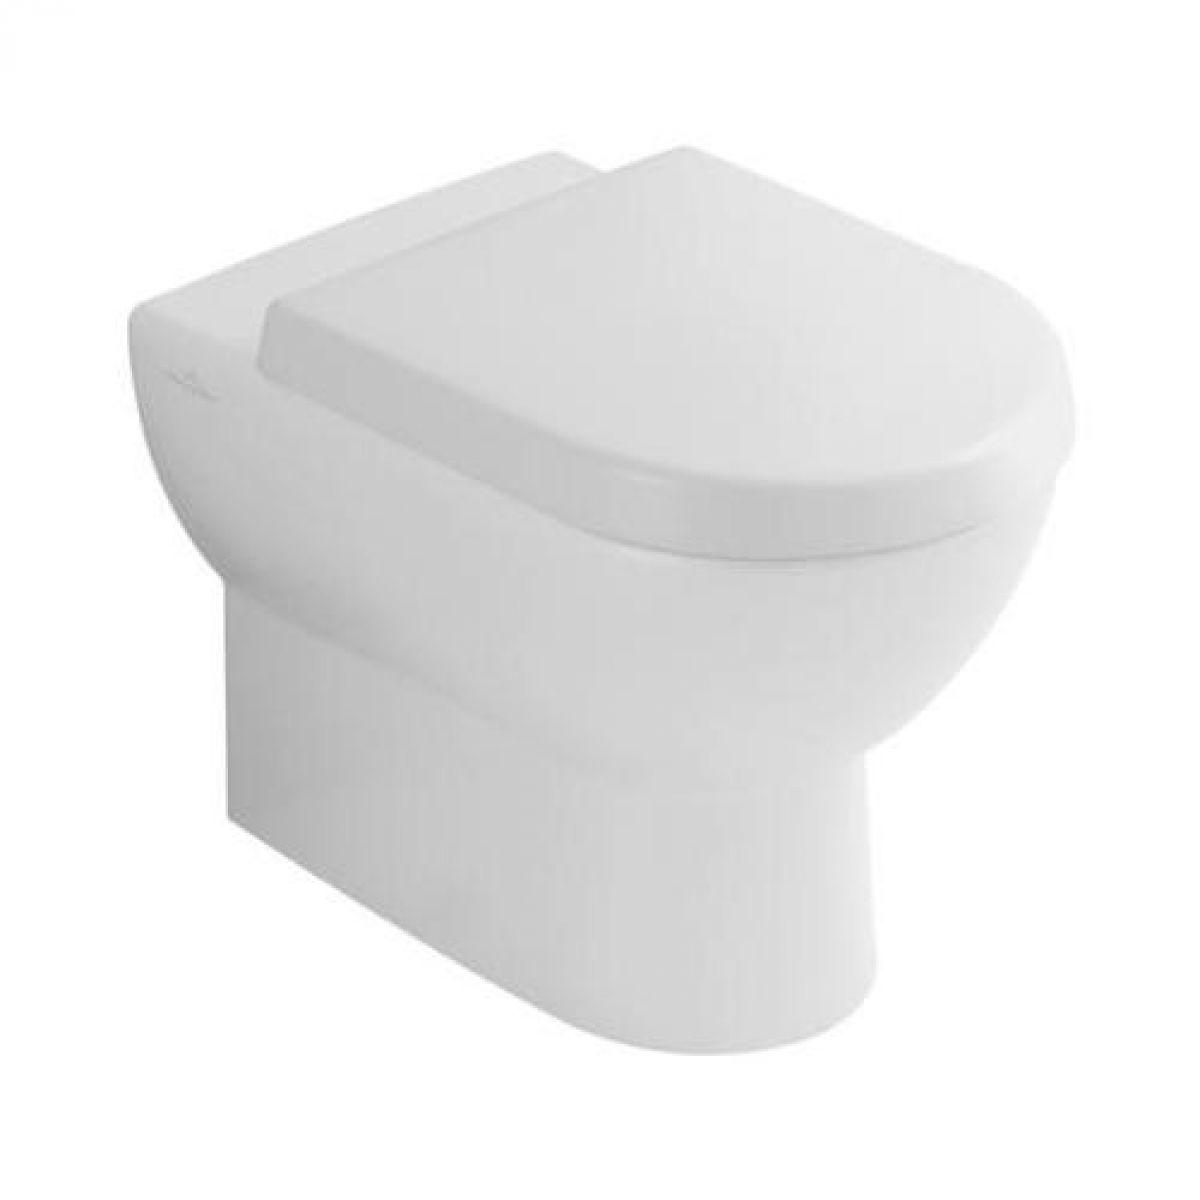 villeroy boch subway floorstanding toilet uk bathrooms. Black Bedroom Furniture Sets. Home Design Ideas